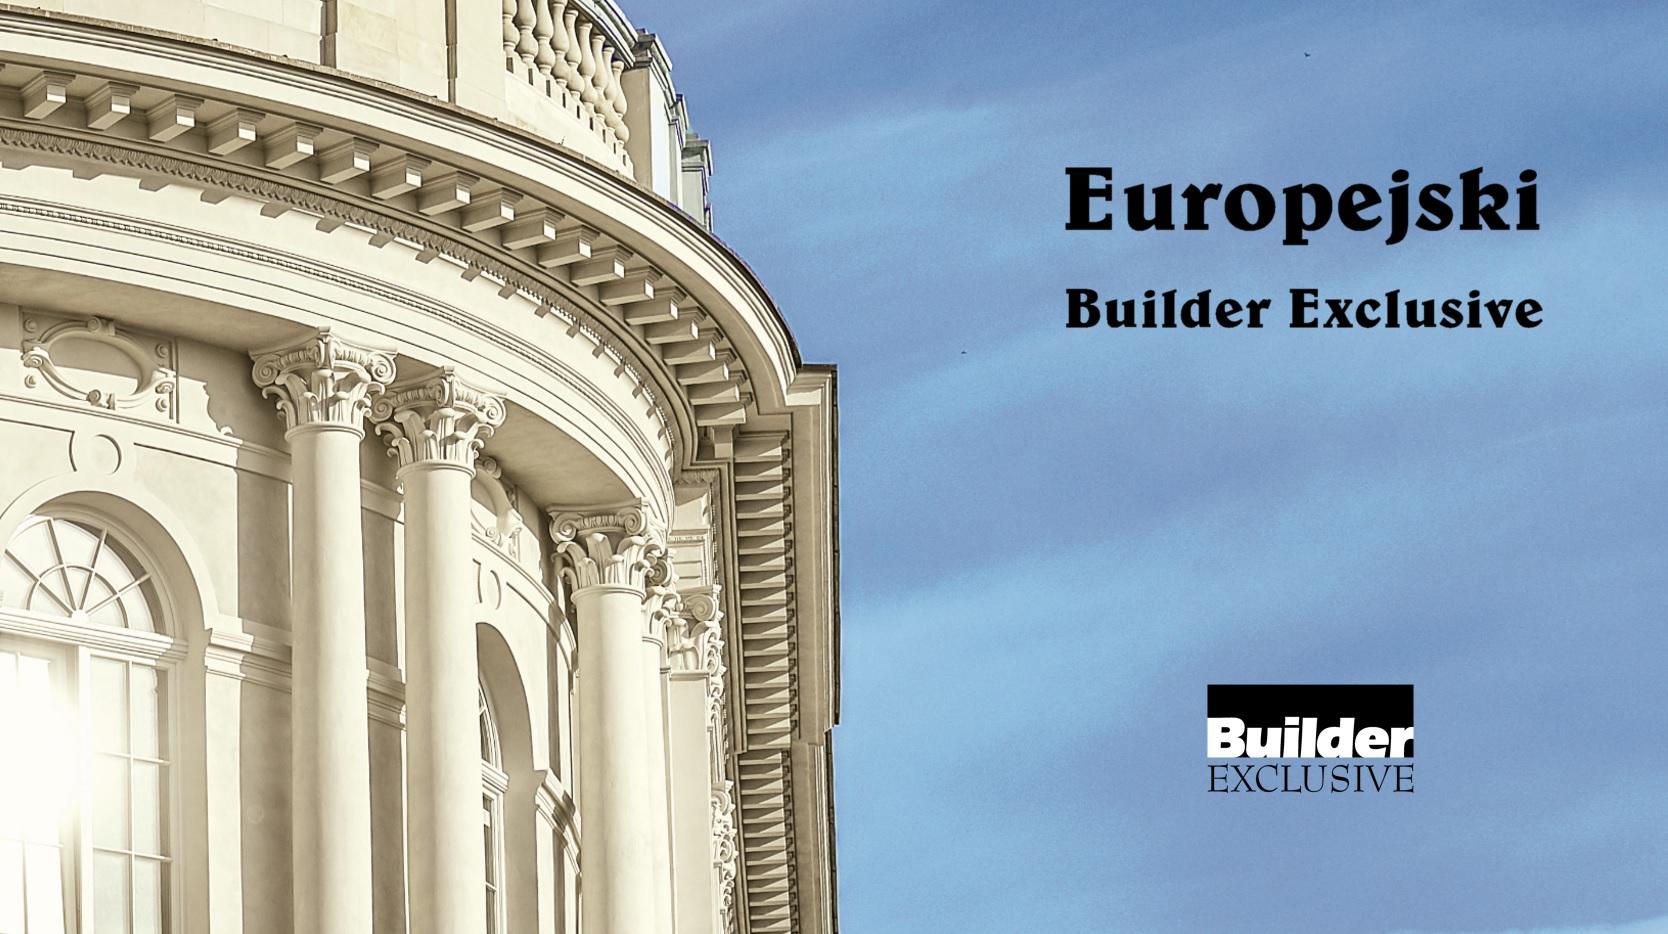 LUKSUS NA SKALĘ EUROPY